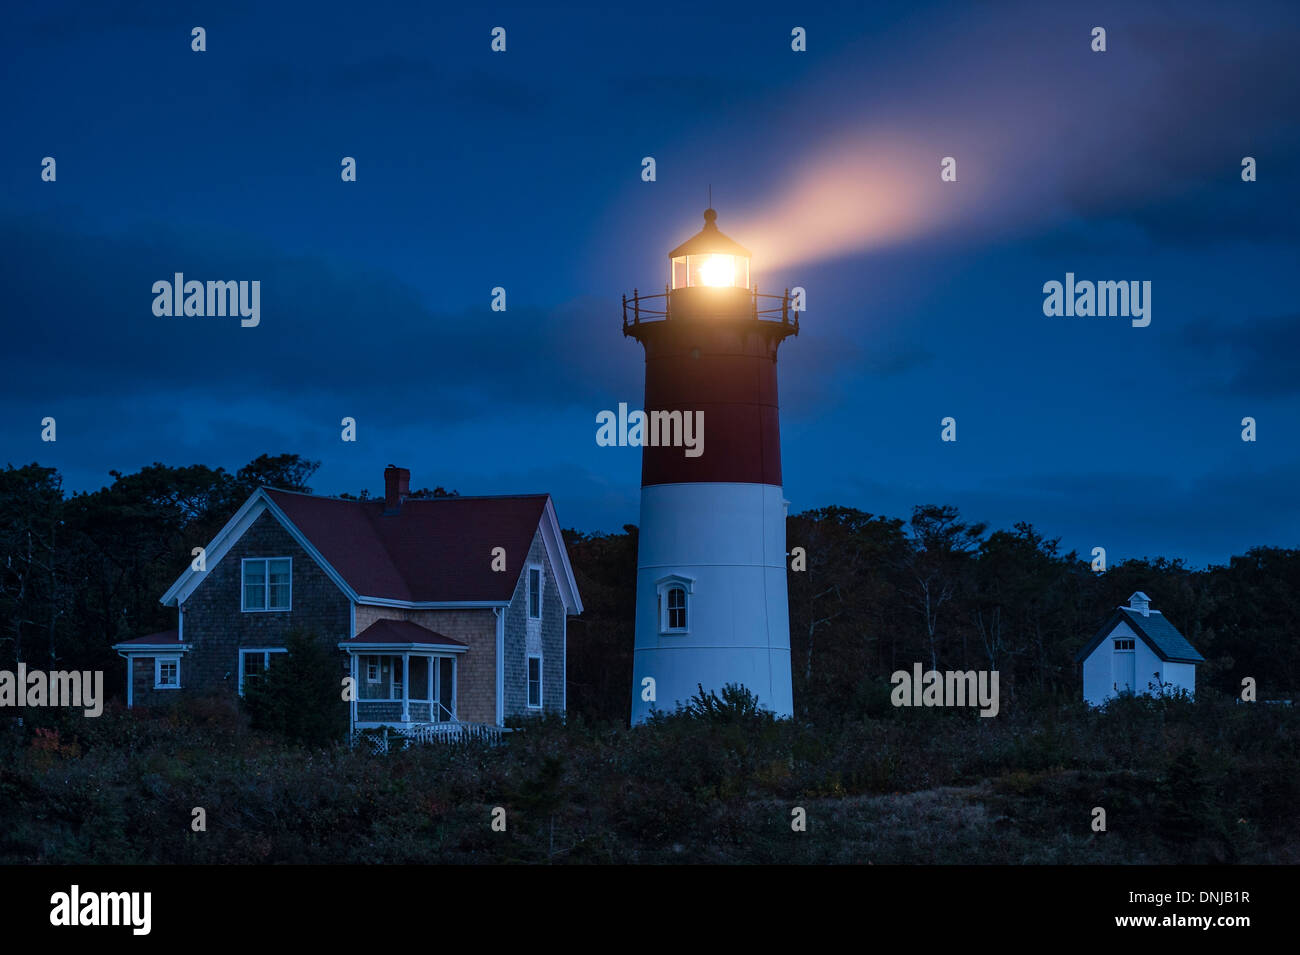 Nauset Light shines at night, Cape Cod National Seashore, Eastham, Cape Cod, MA, USA - Stock Image